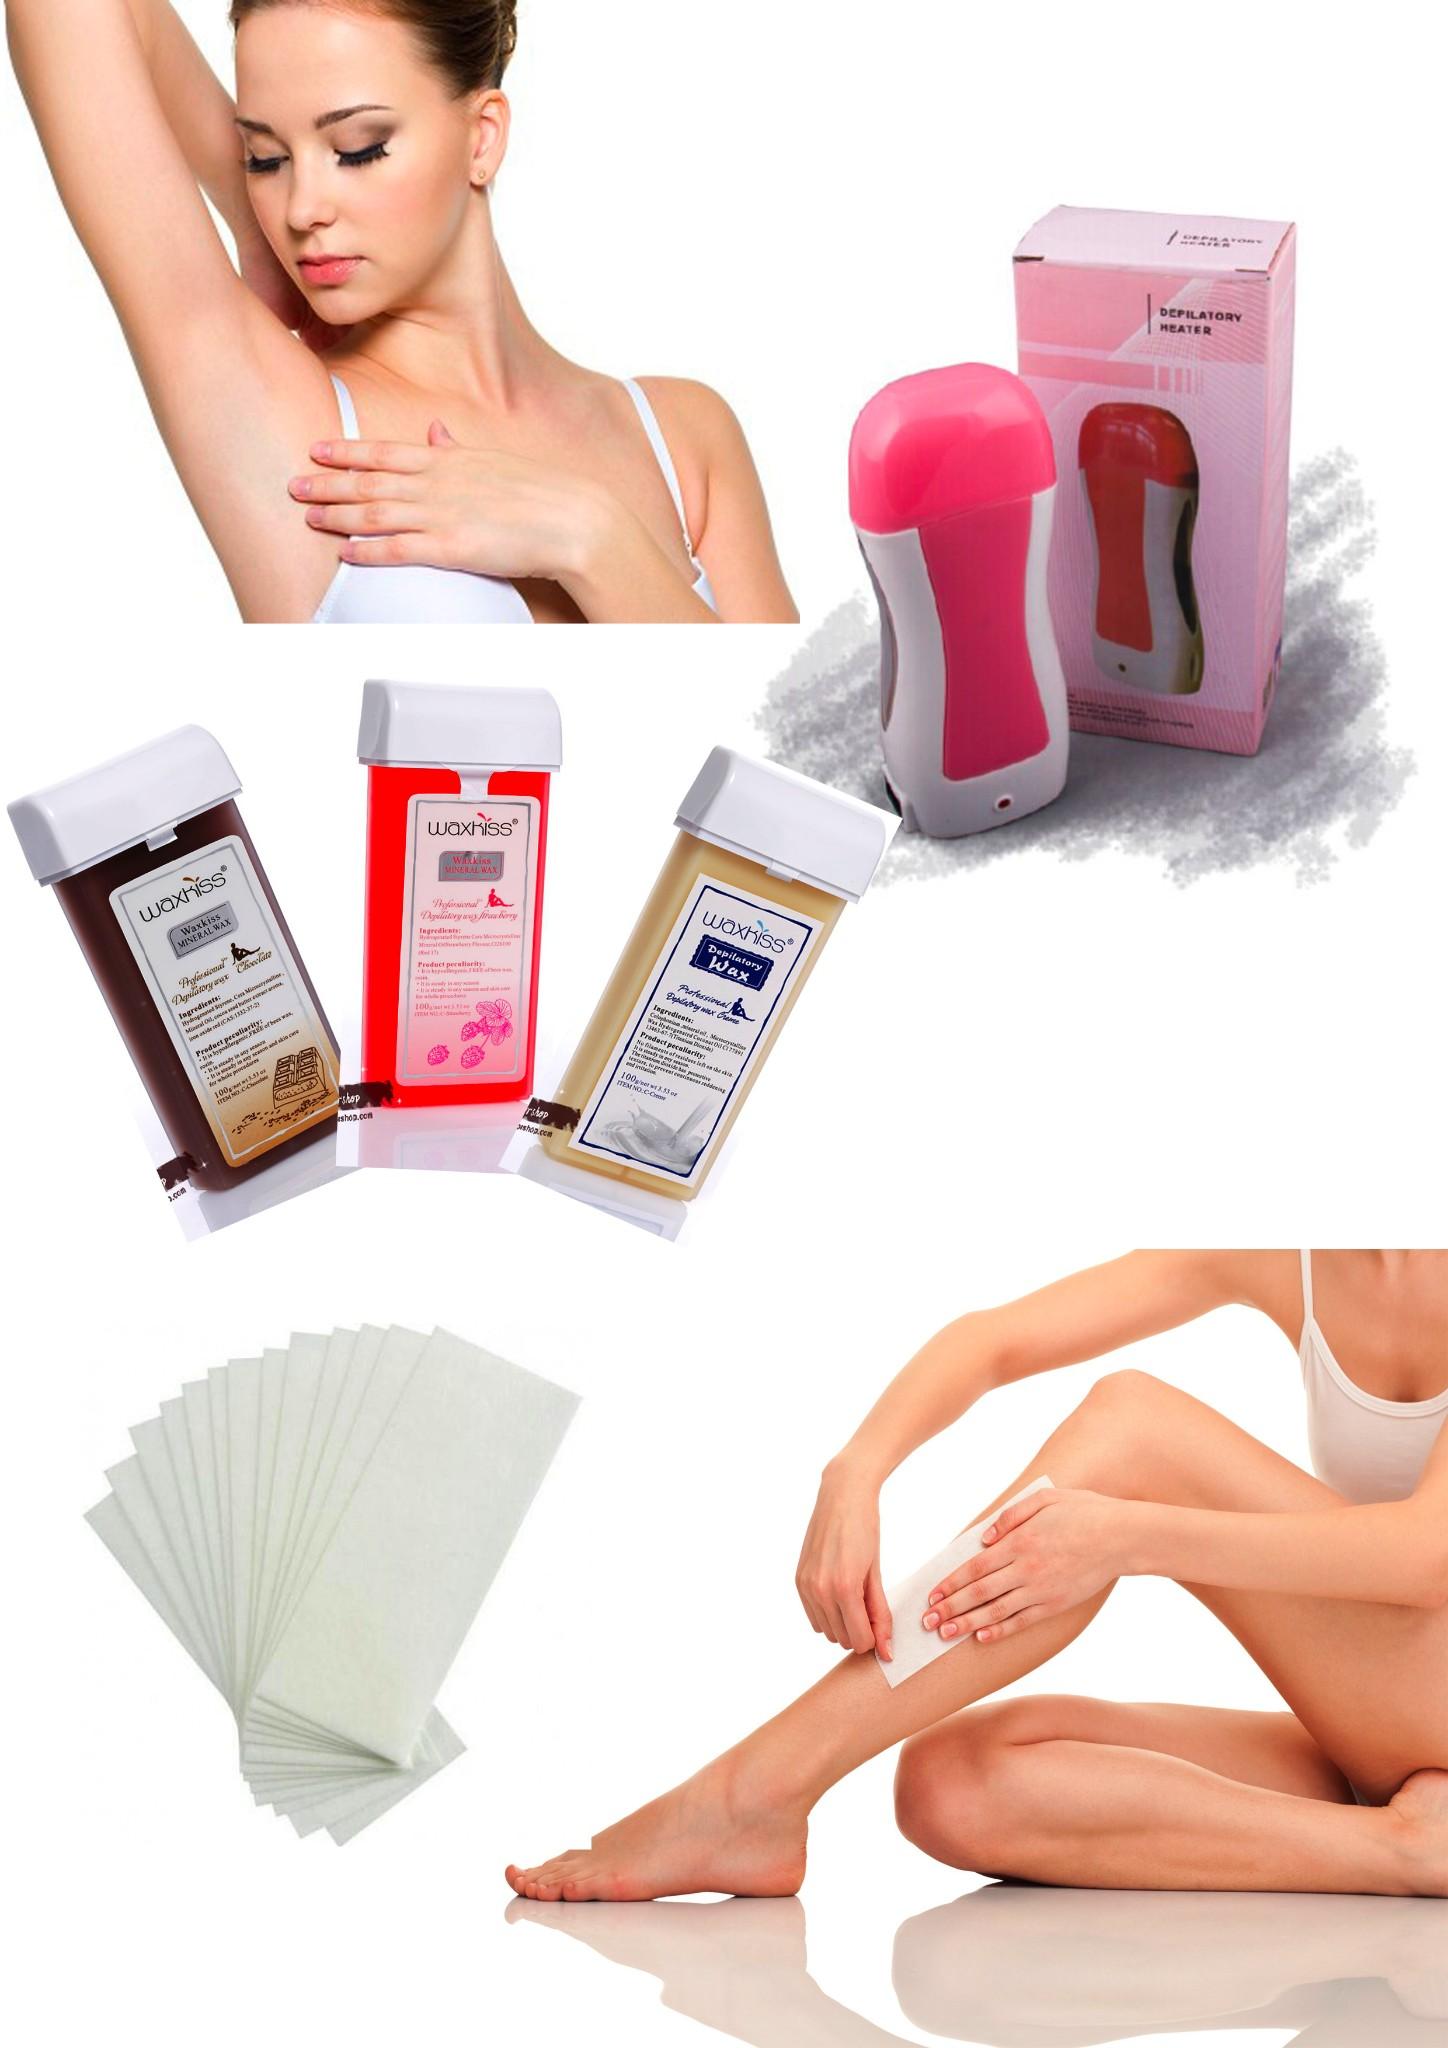 Jual Roll On Wax Set Penghilang Bulu Ketiak Underarm Tangan Kaki Dll Twind Supplier Tokopedia